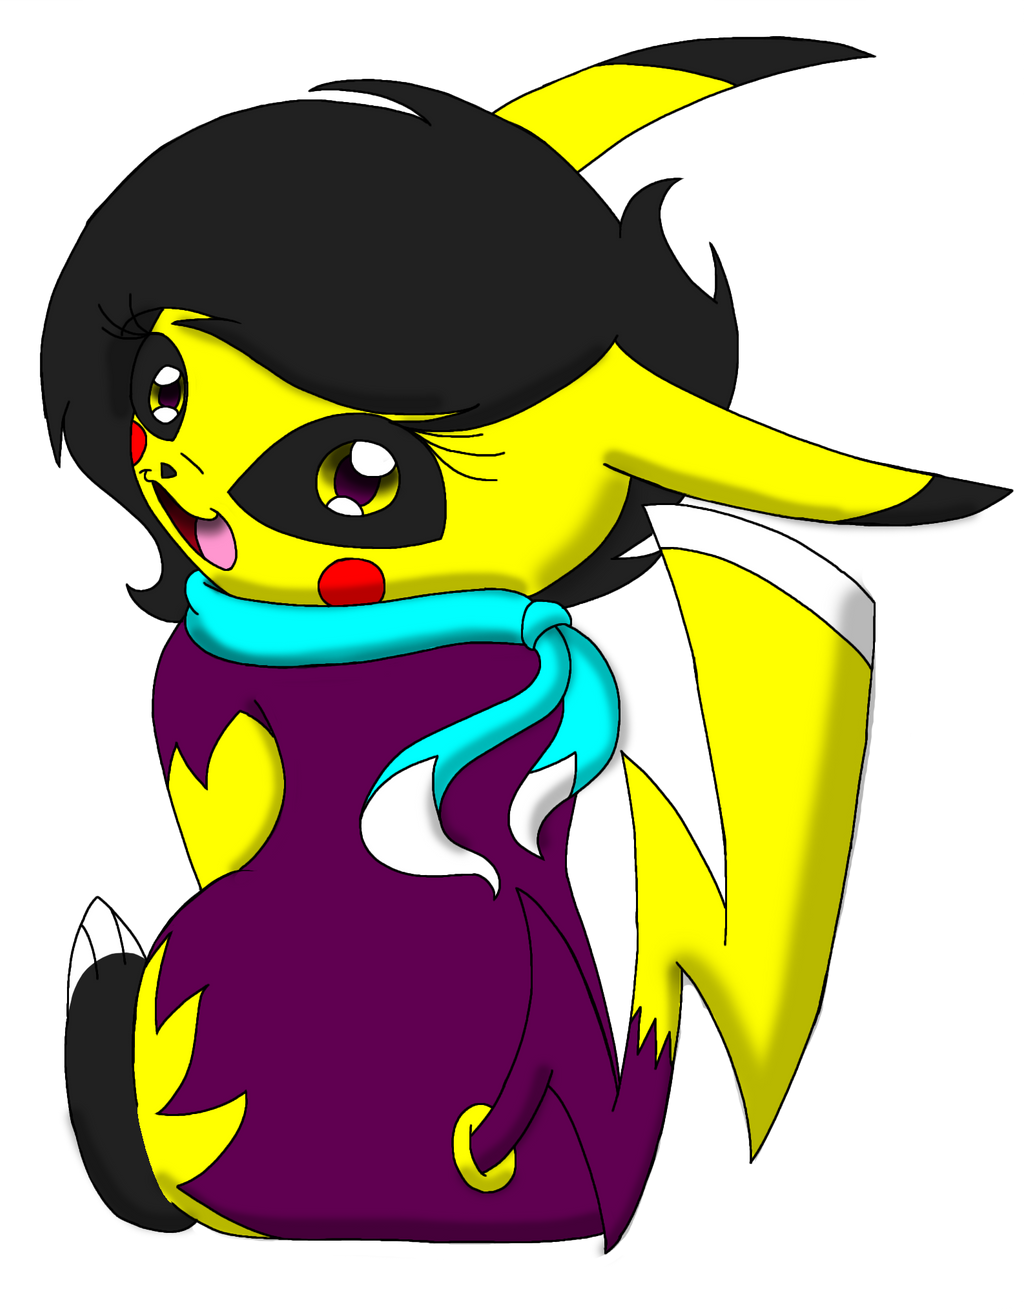 RoxasPikachu's Profile Picture